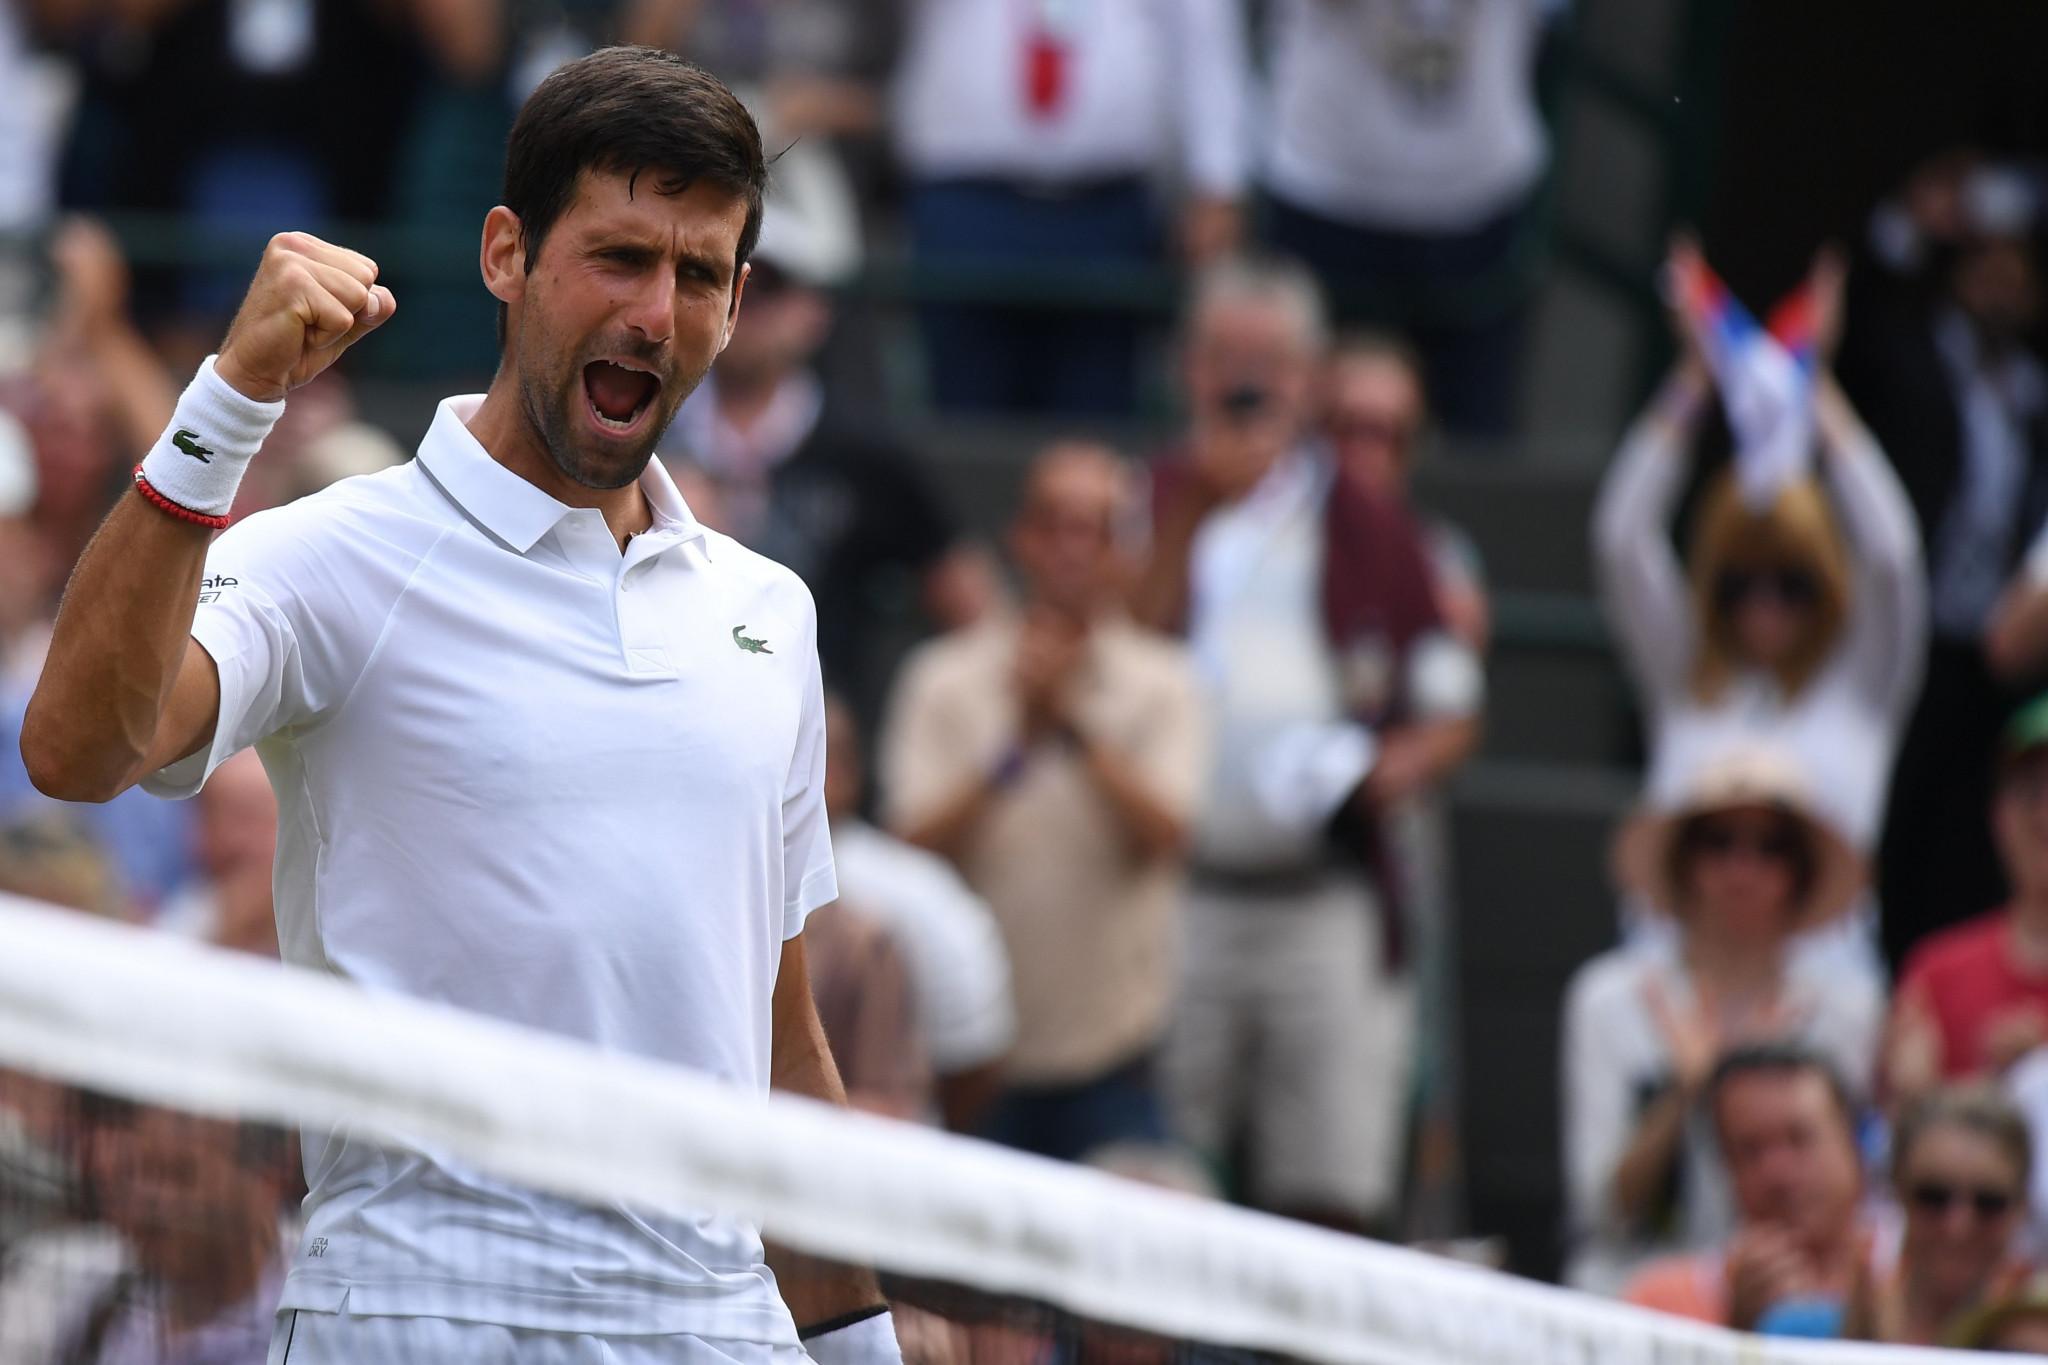 Defending champion Djokovic through to fourth round at Wimbledon